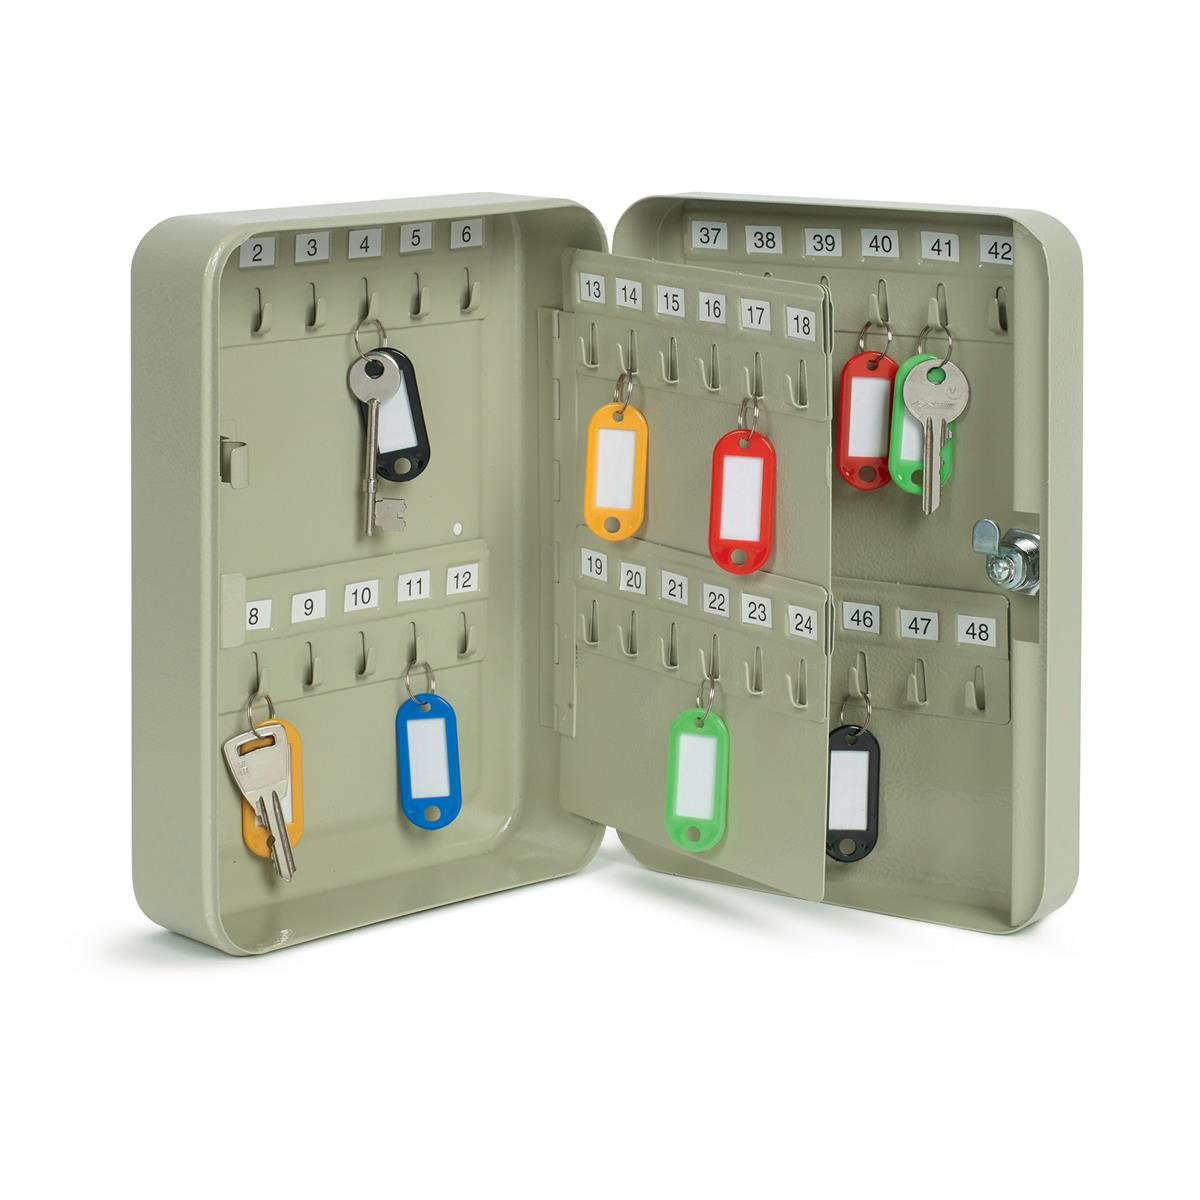 Key Cabinet Steel Lockable With Wall Fixings Holds 48 Keys Grey